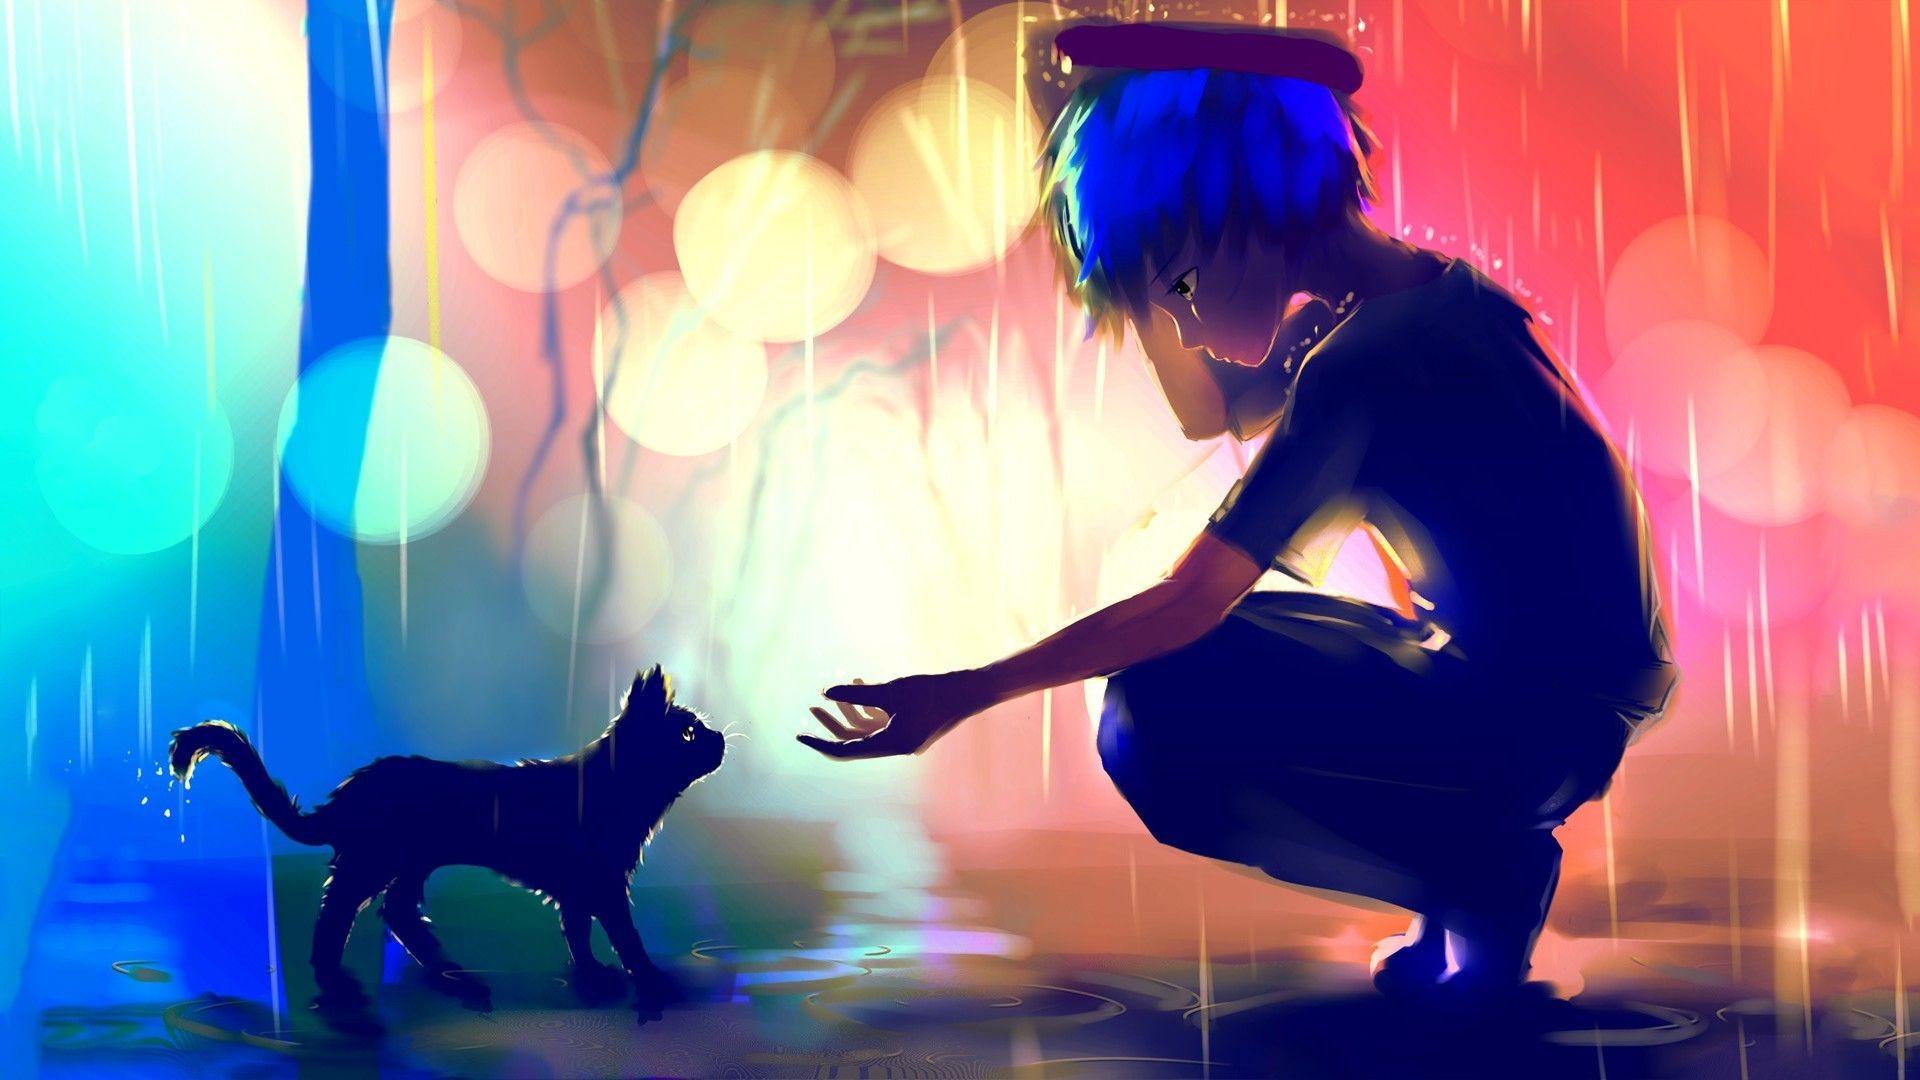 Black cat boy anime